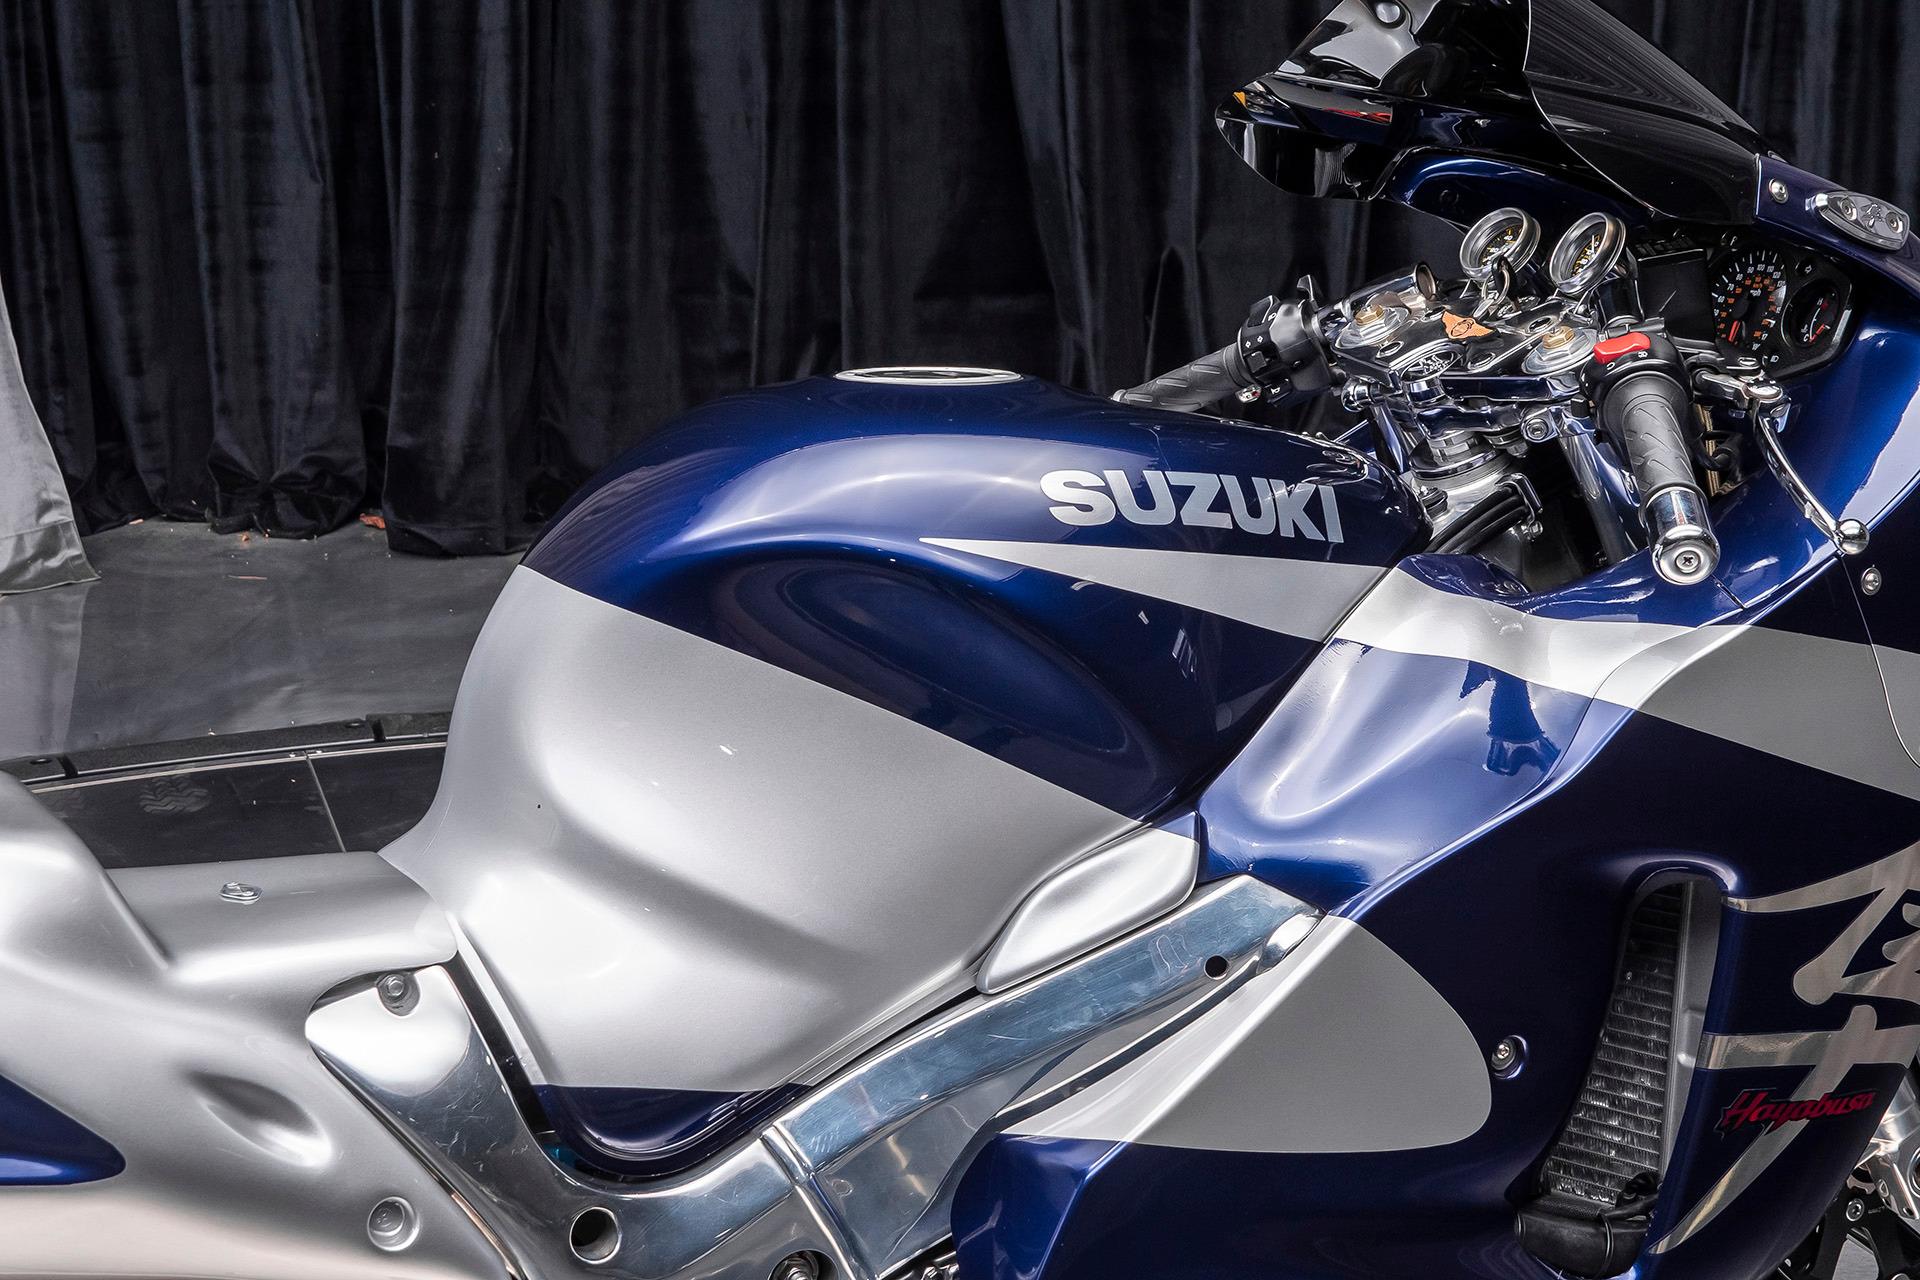 Used-2004-Suzuki-GSX1300-HAYABUSA-Turbo-Original-Owner-OVER-500-HORSEPOWER